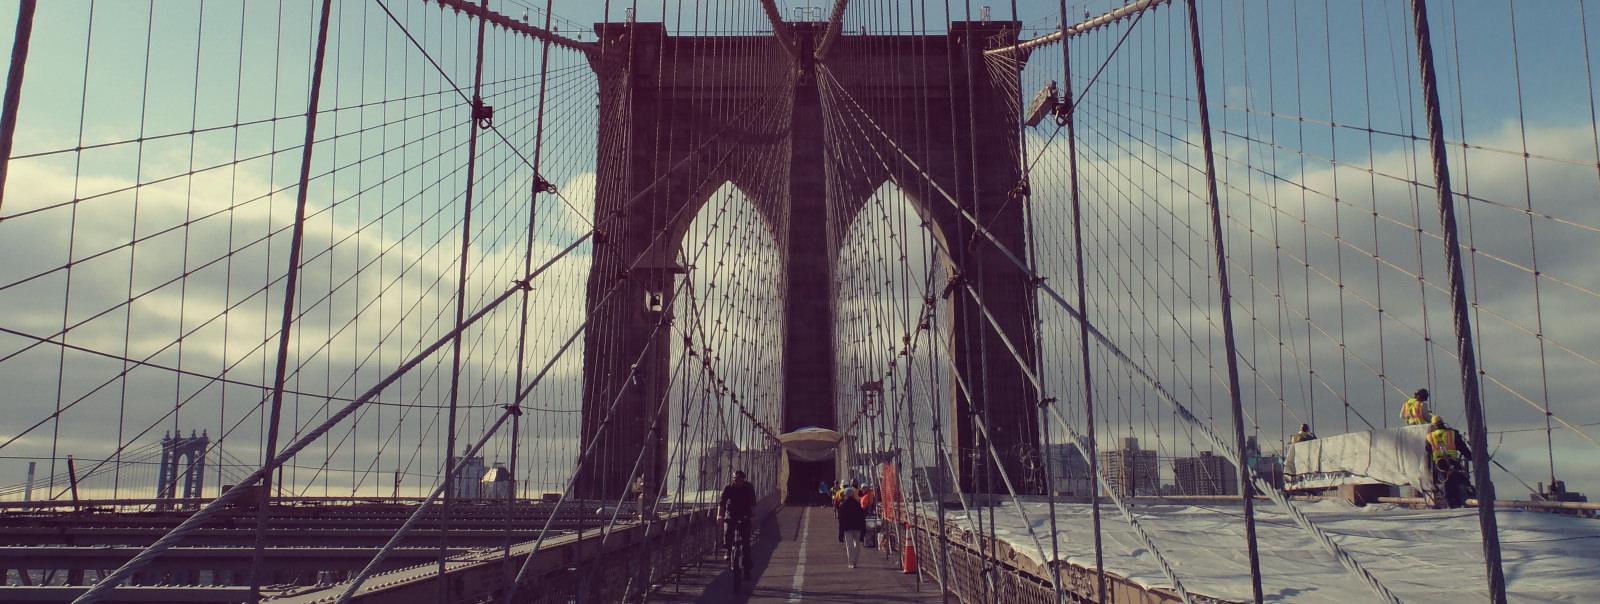 images/unsplash_brooklyn-bridge_header.jpg